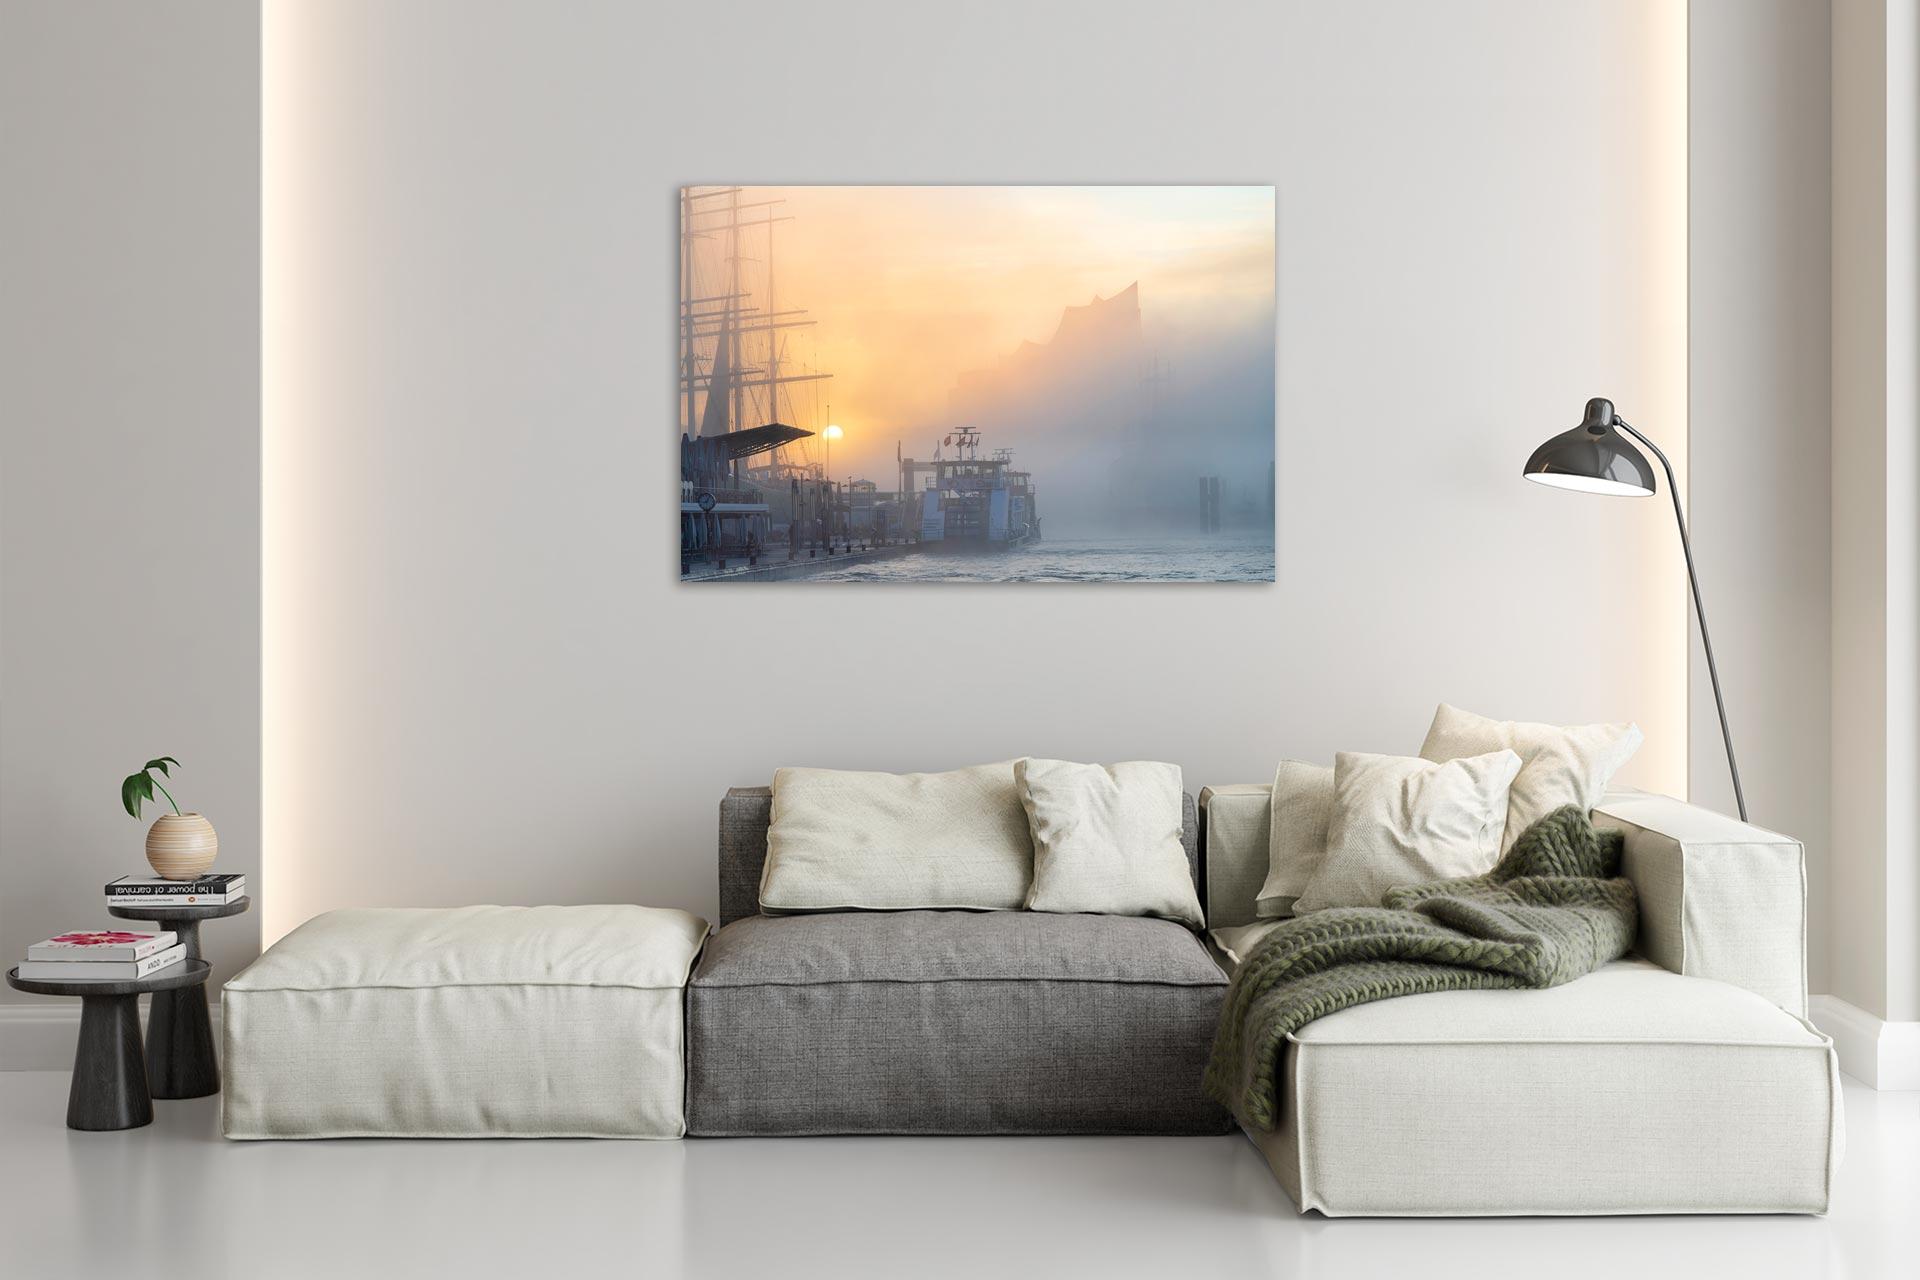 LCW299-wandbild-bild-auf-leinwand-acrylglas-aludibond-wohnzimmer